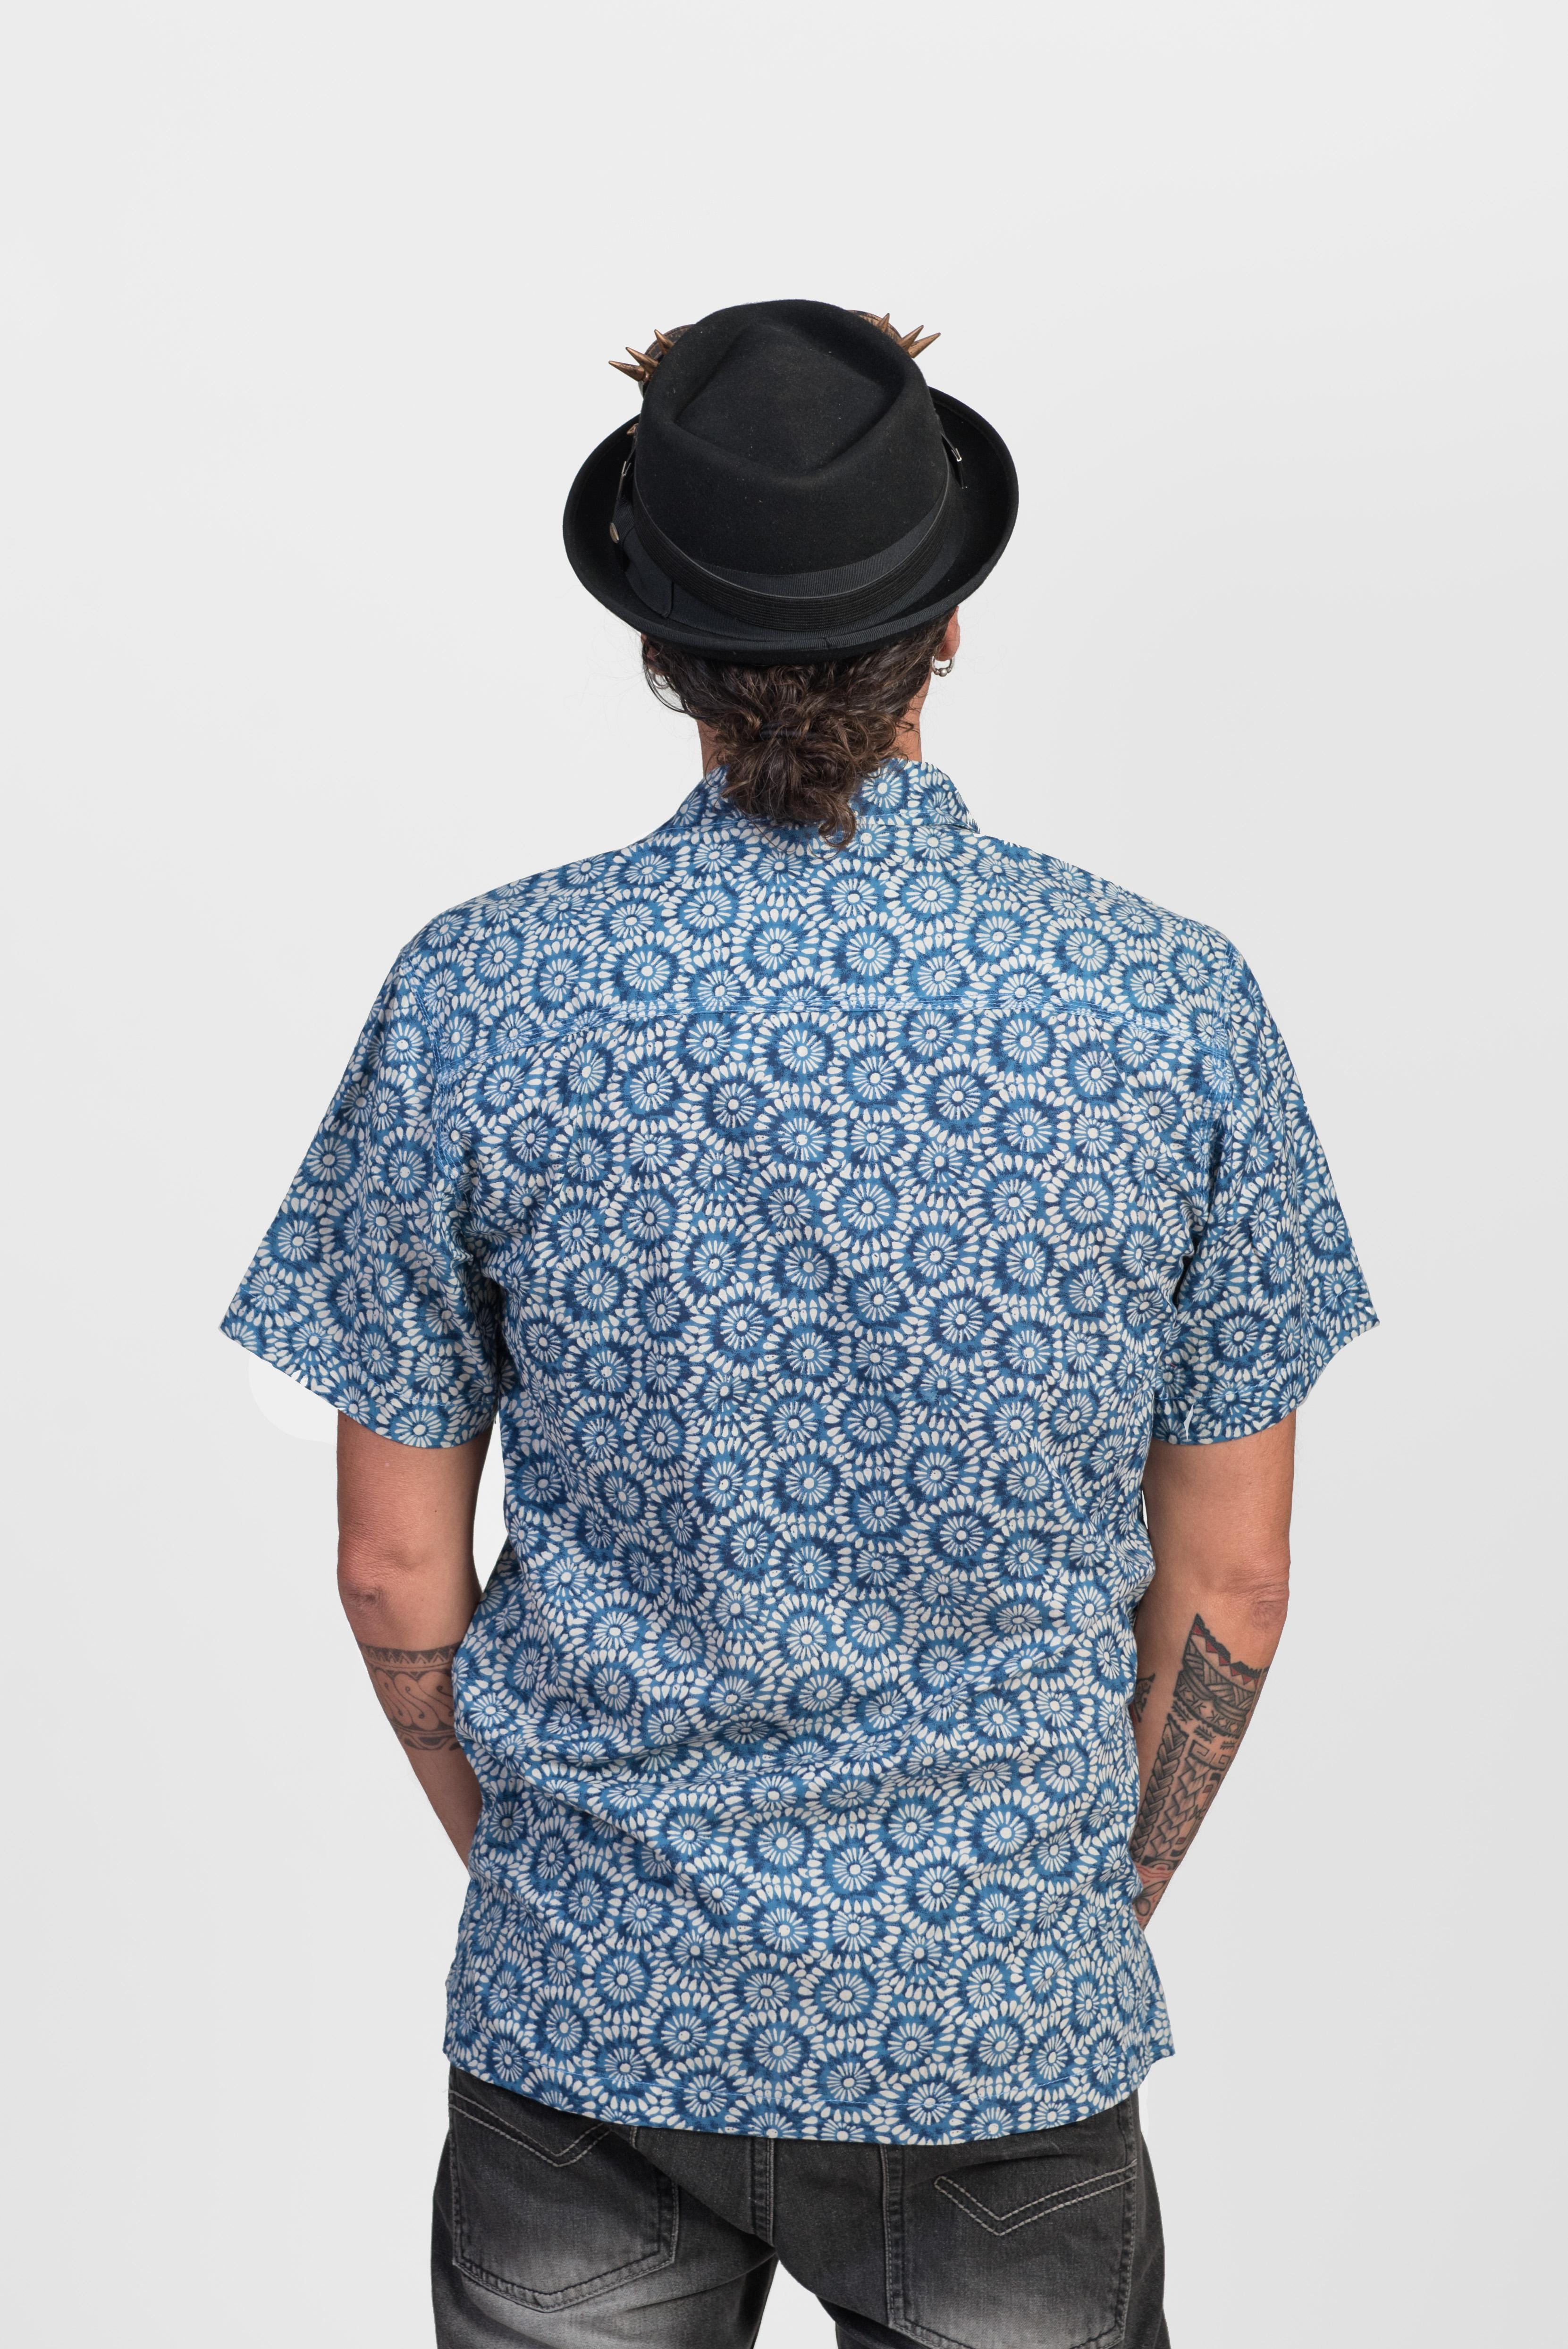 Men's Shirt - Blue Flowers